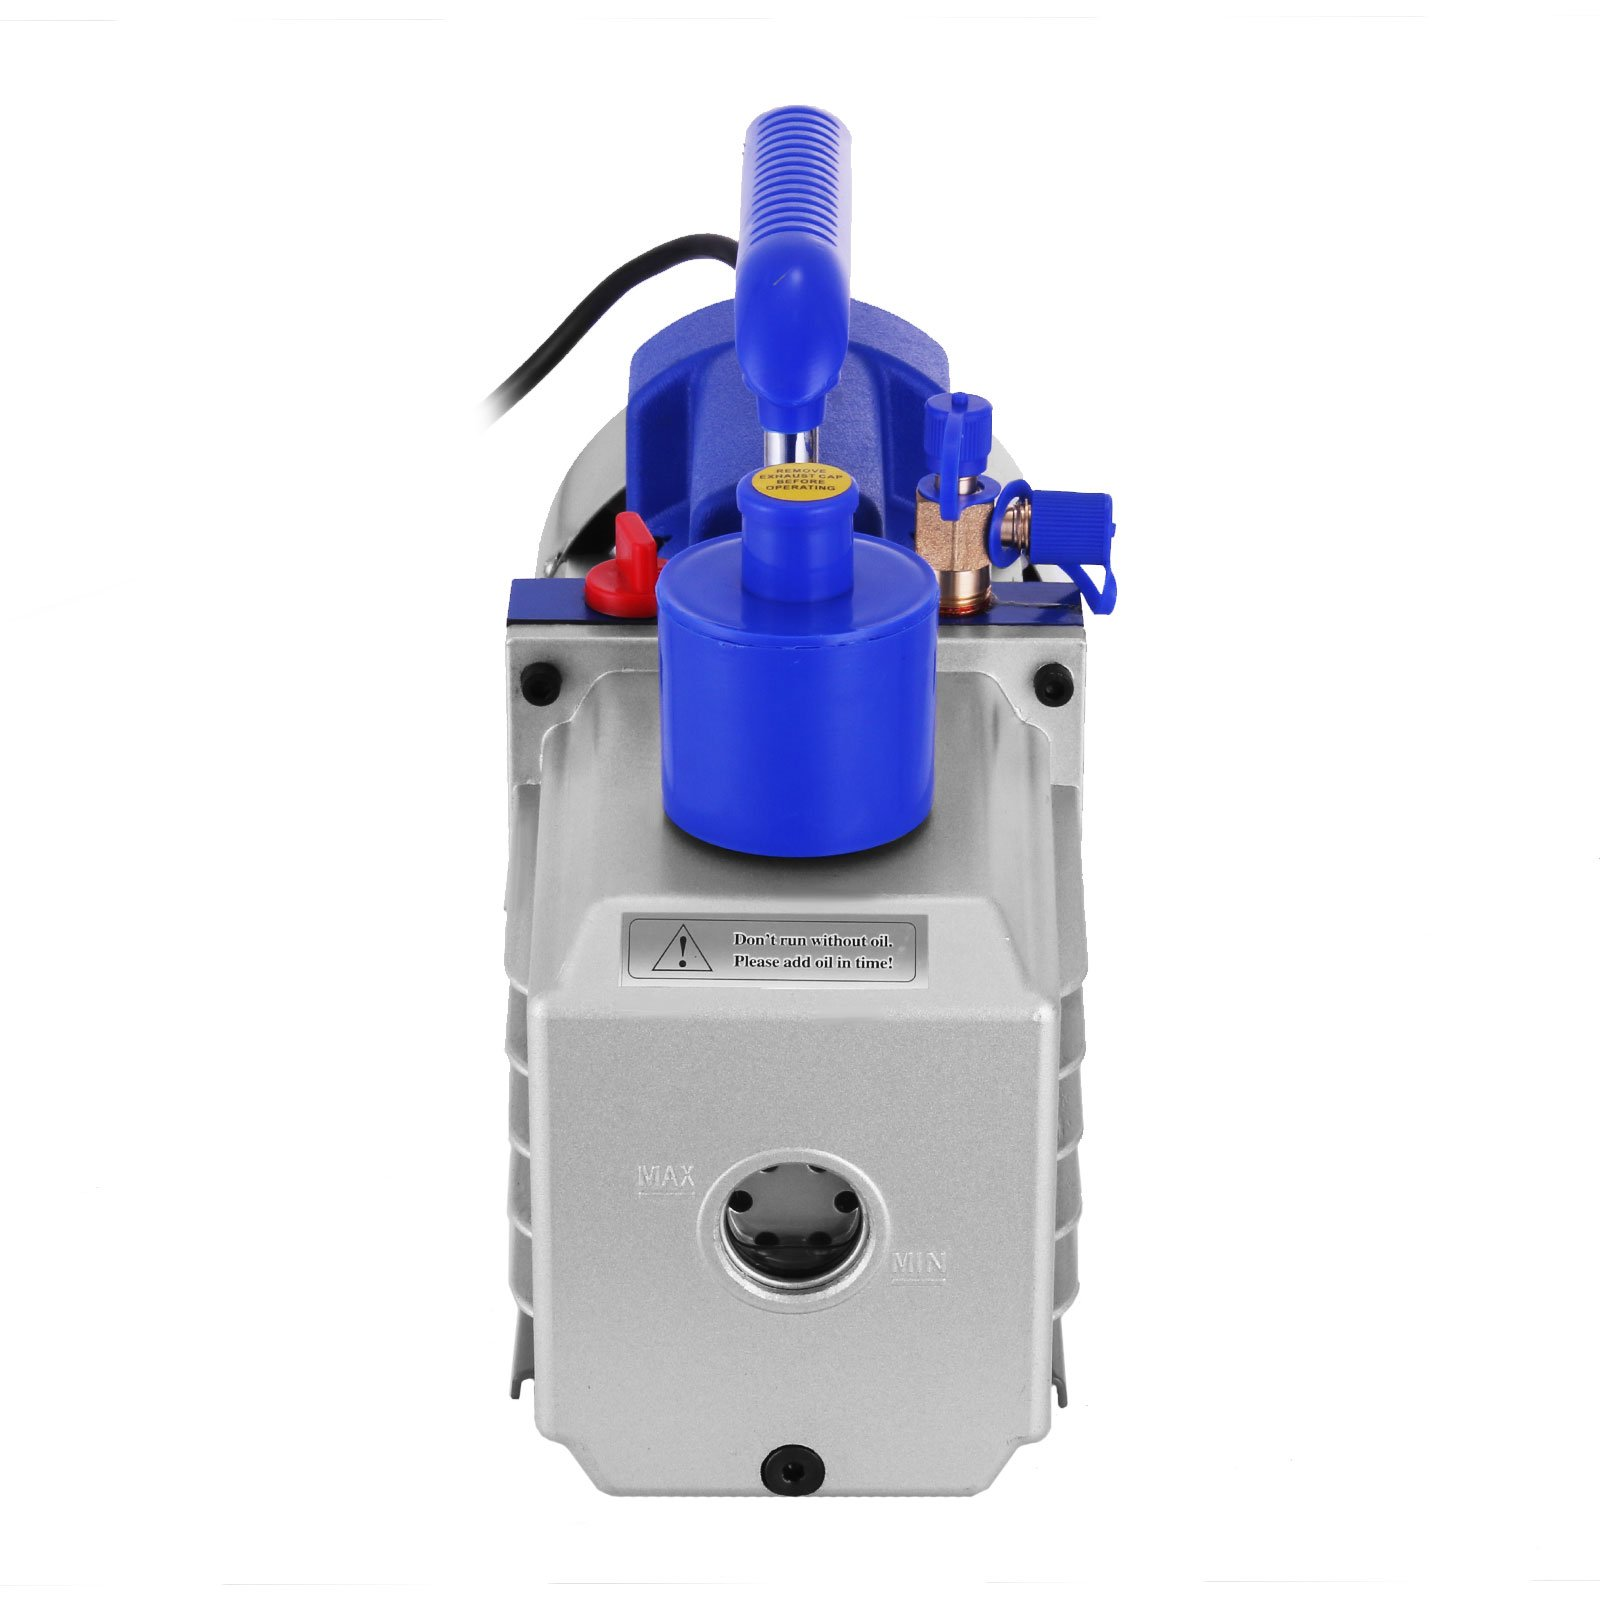 VEVOR Vacuum Pump 9CFM 1HP Two Stage HVAC Rotary Vane Vacuum Pump Wine Degassing Milking Medical Food Processing Air Conditioning Auto AC Refrigerant Vacuum Pump (2-Stage, 9CFM) by VEVOR (Image #5)